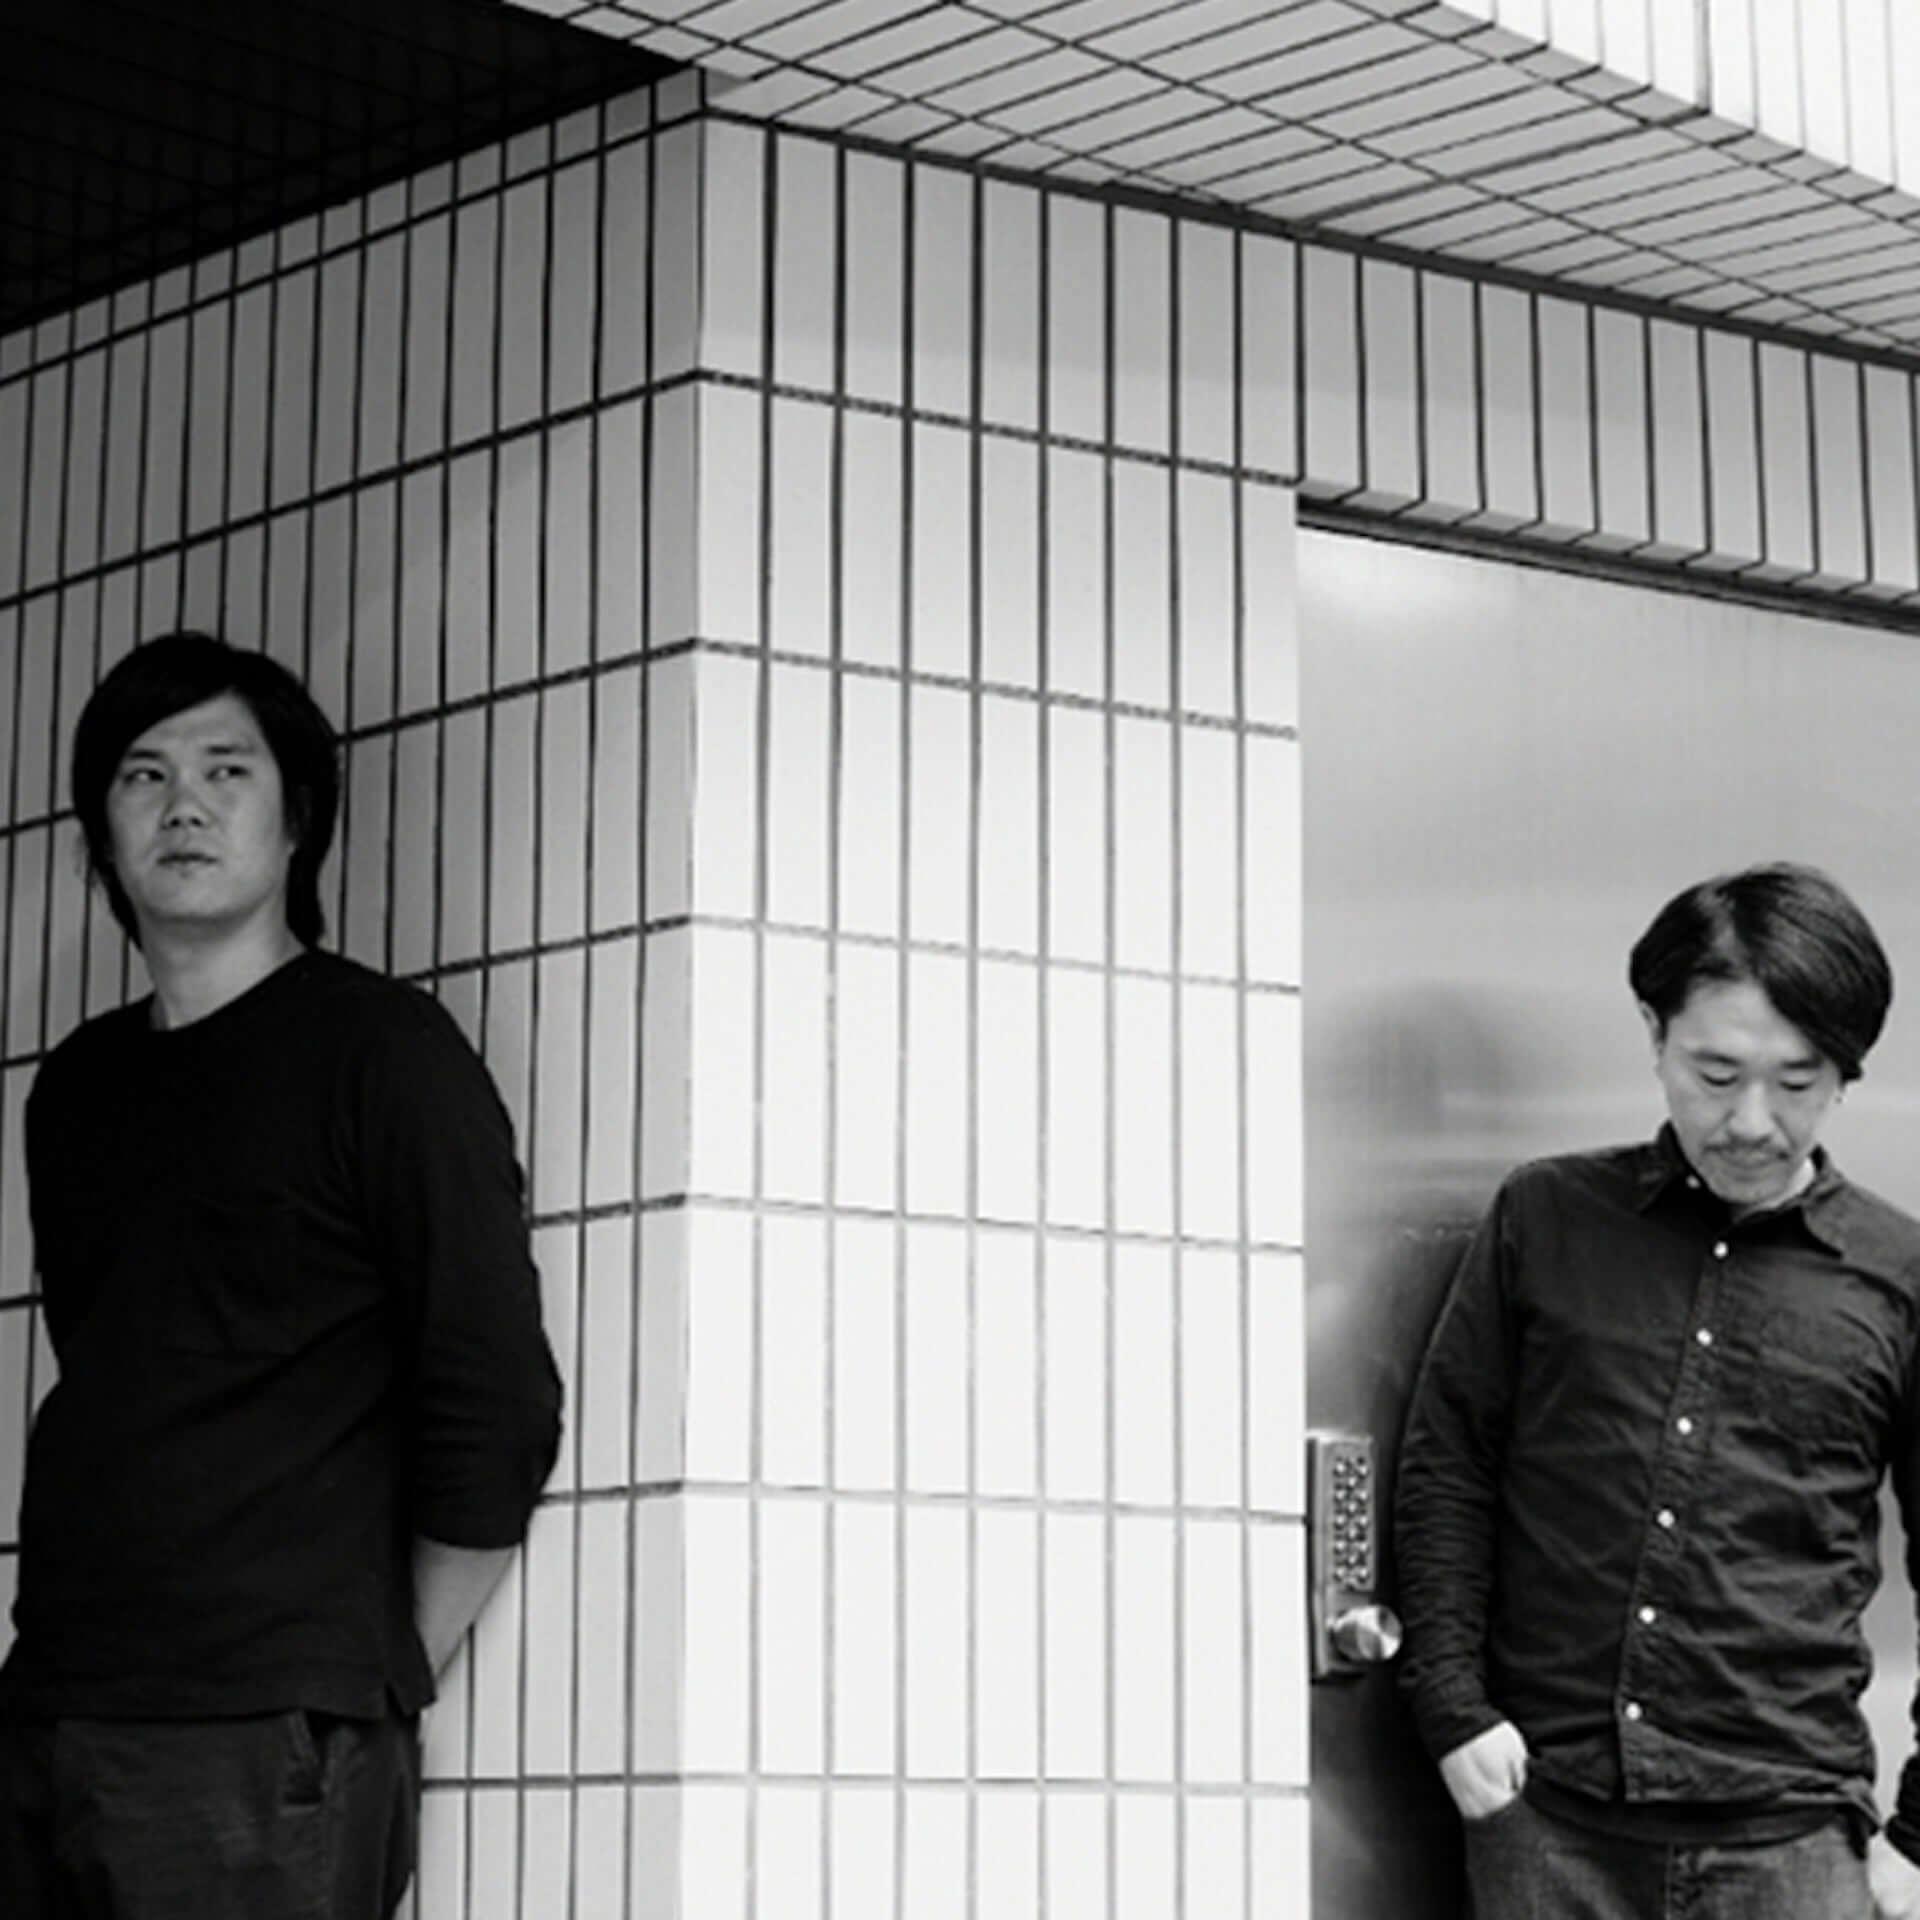 Gonno×Masumura、YPY×山本達久のコラボライブなど盛り沢山!渋谷Contactにて年末の祝祭<KALMANEIT>が開催決定 music201208_contact_2-1920x1920